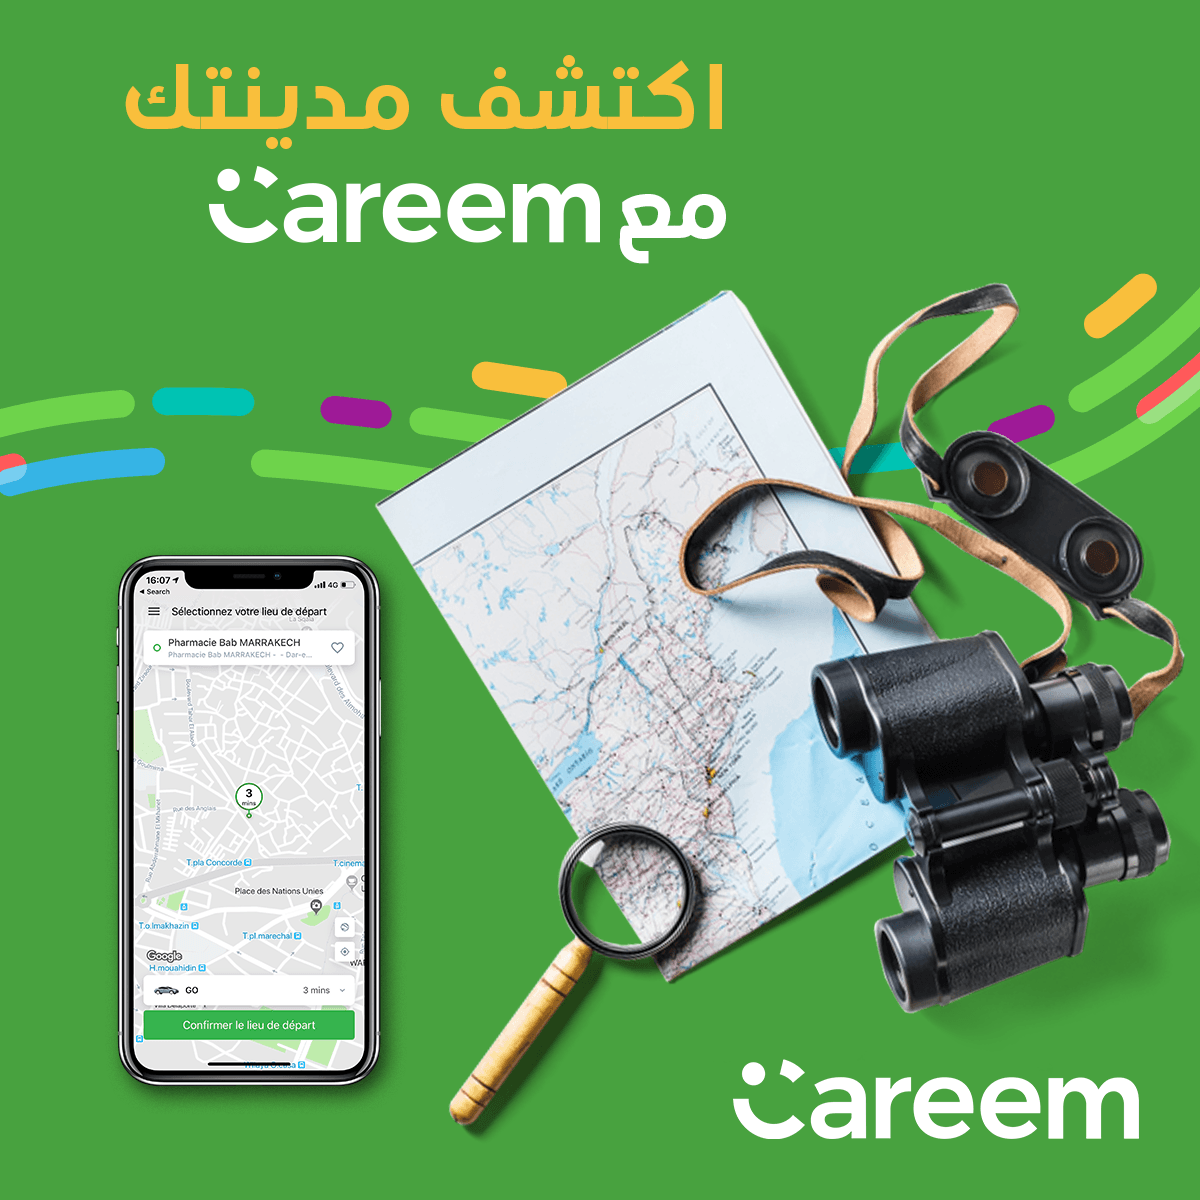 Careem-18